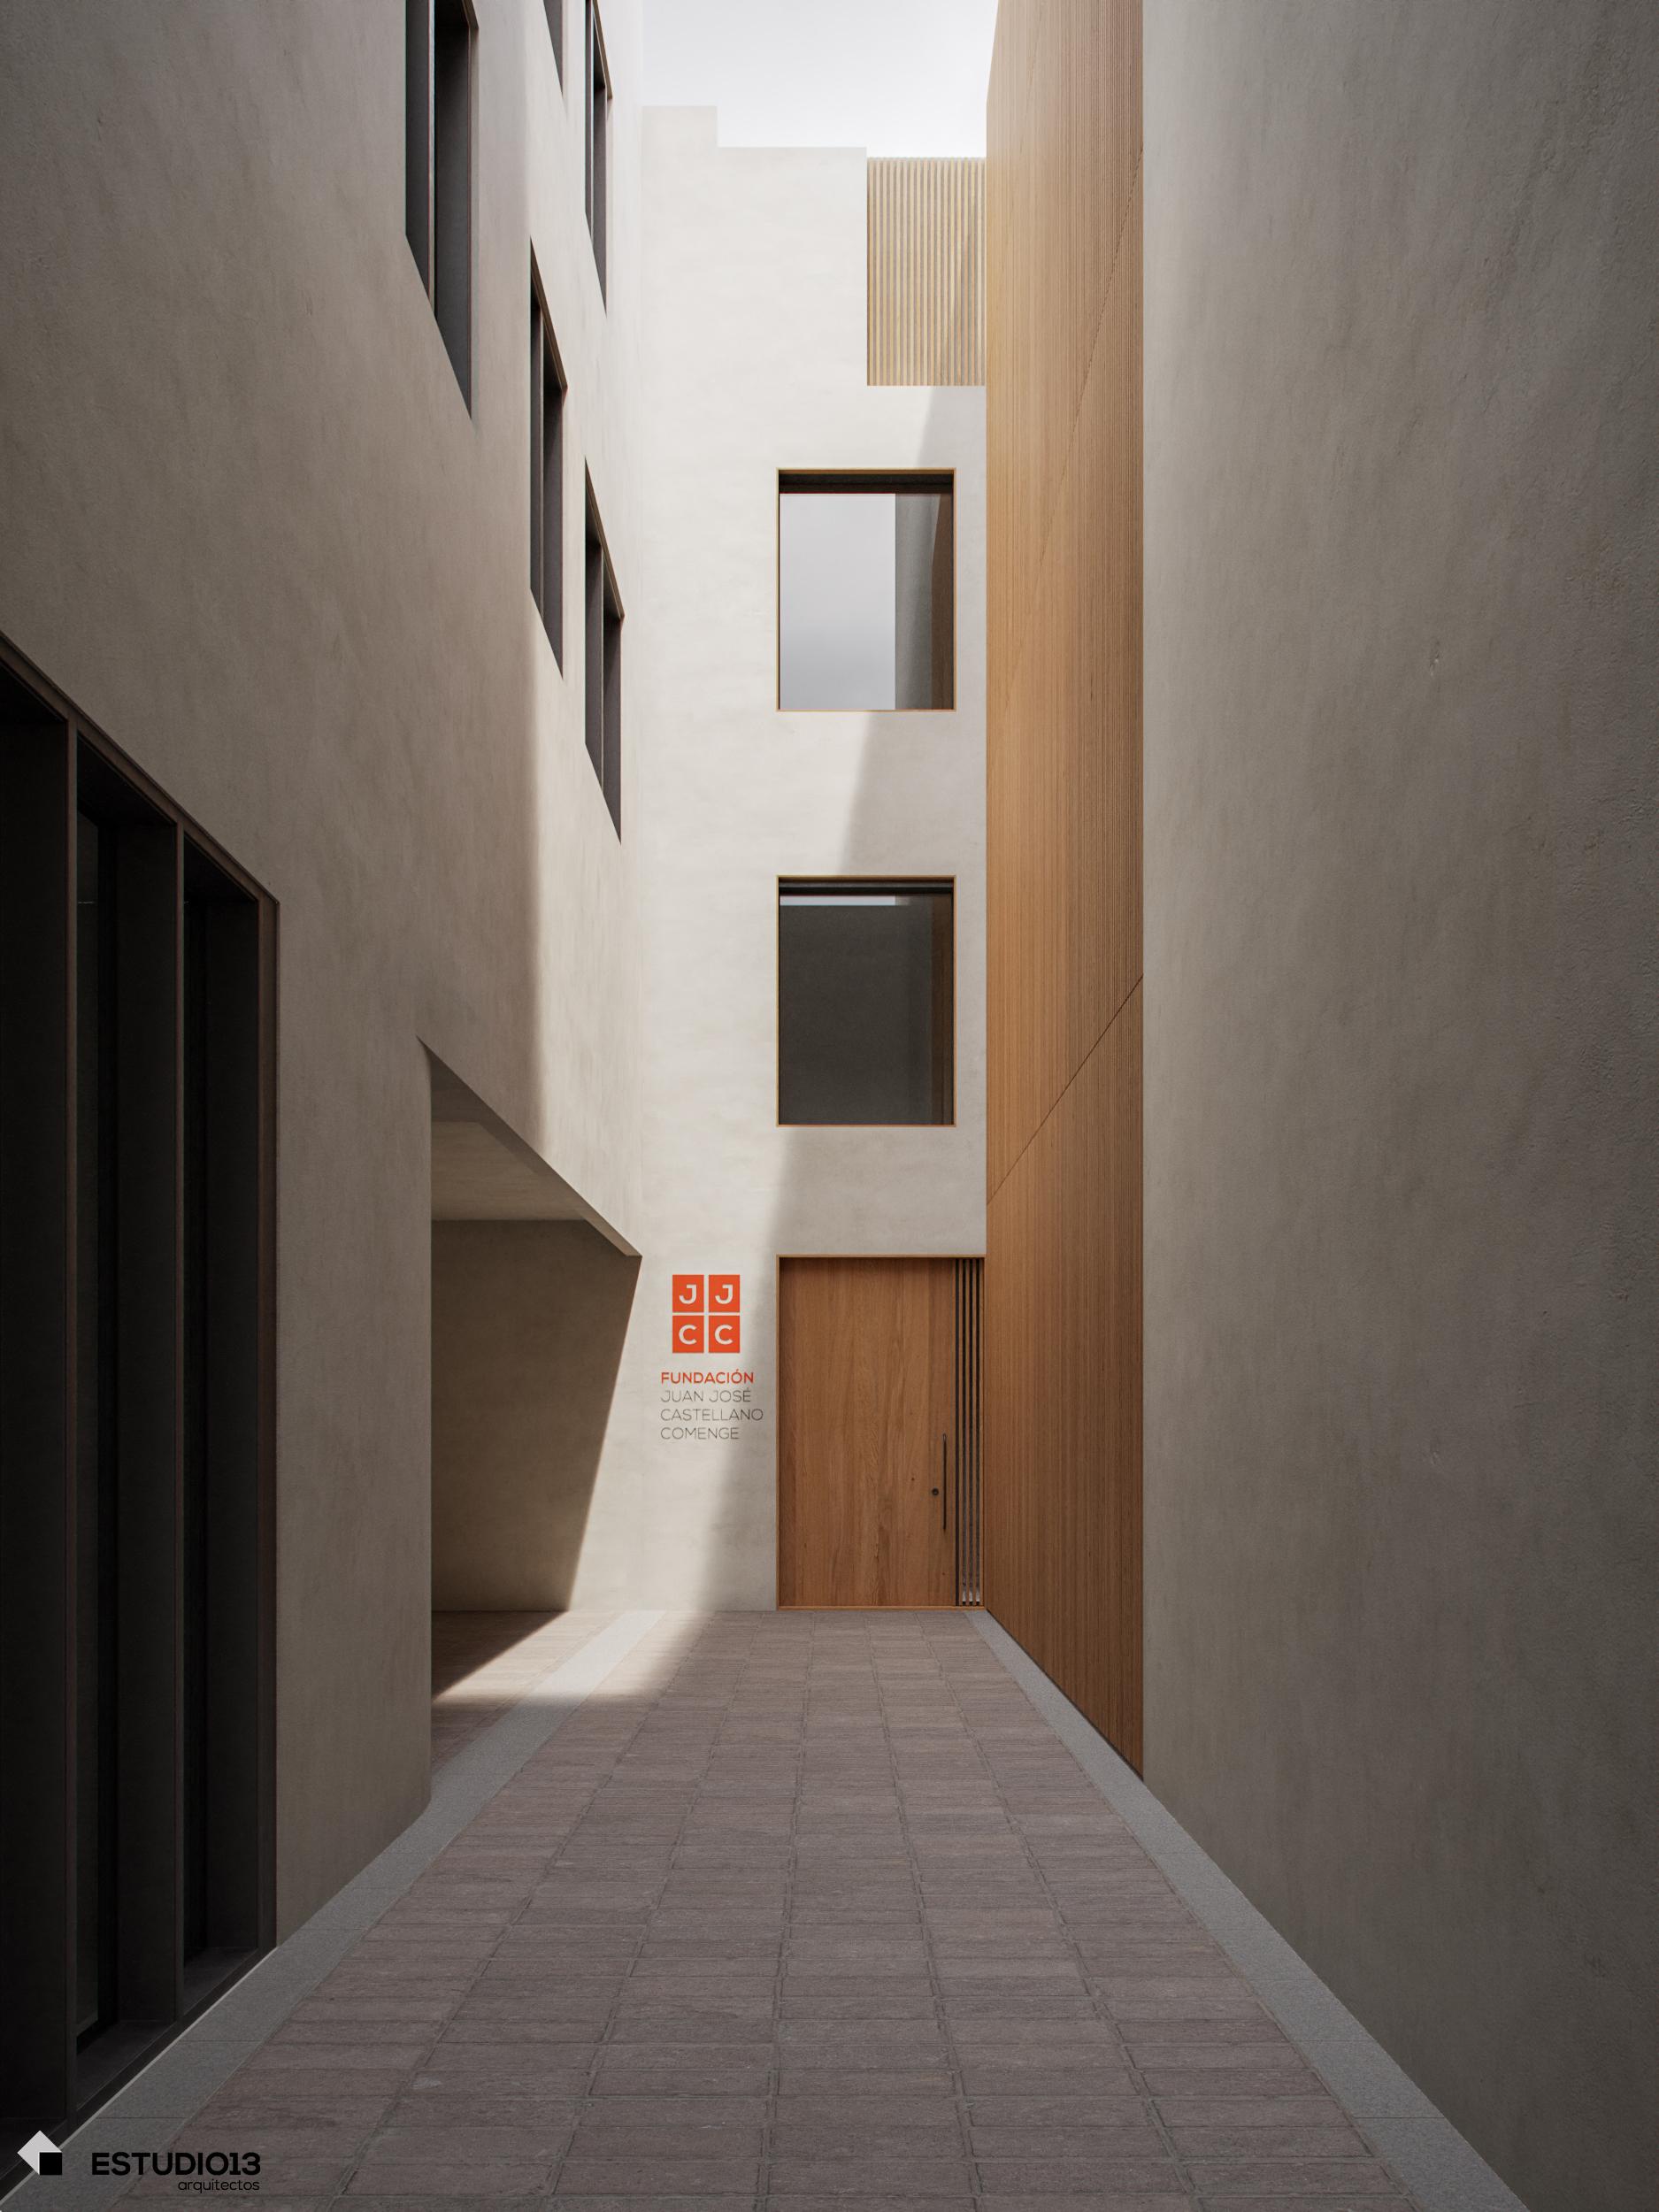 estudio13arquitectos_museo_fundacion_jjcc_plaza_autor_6